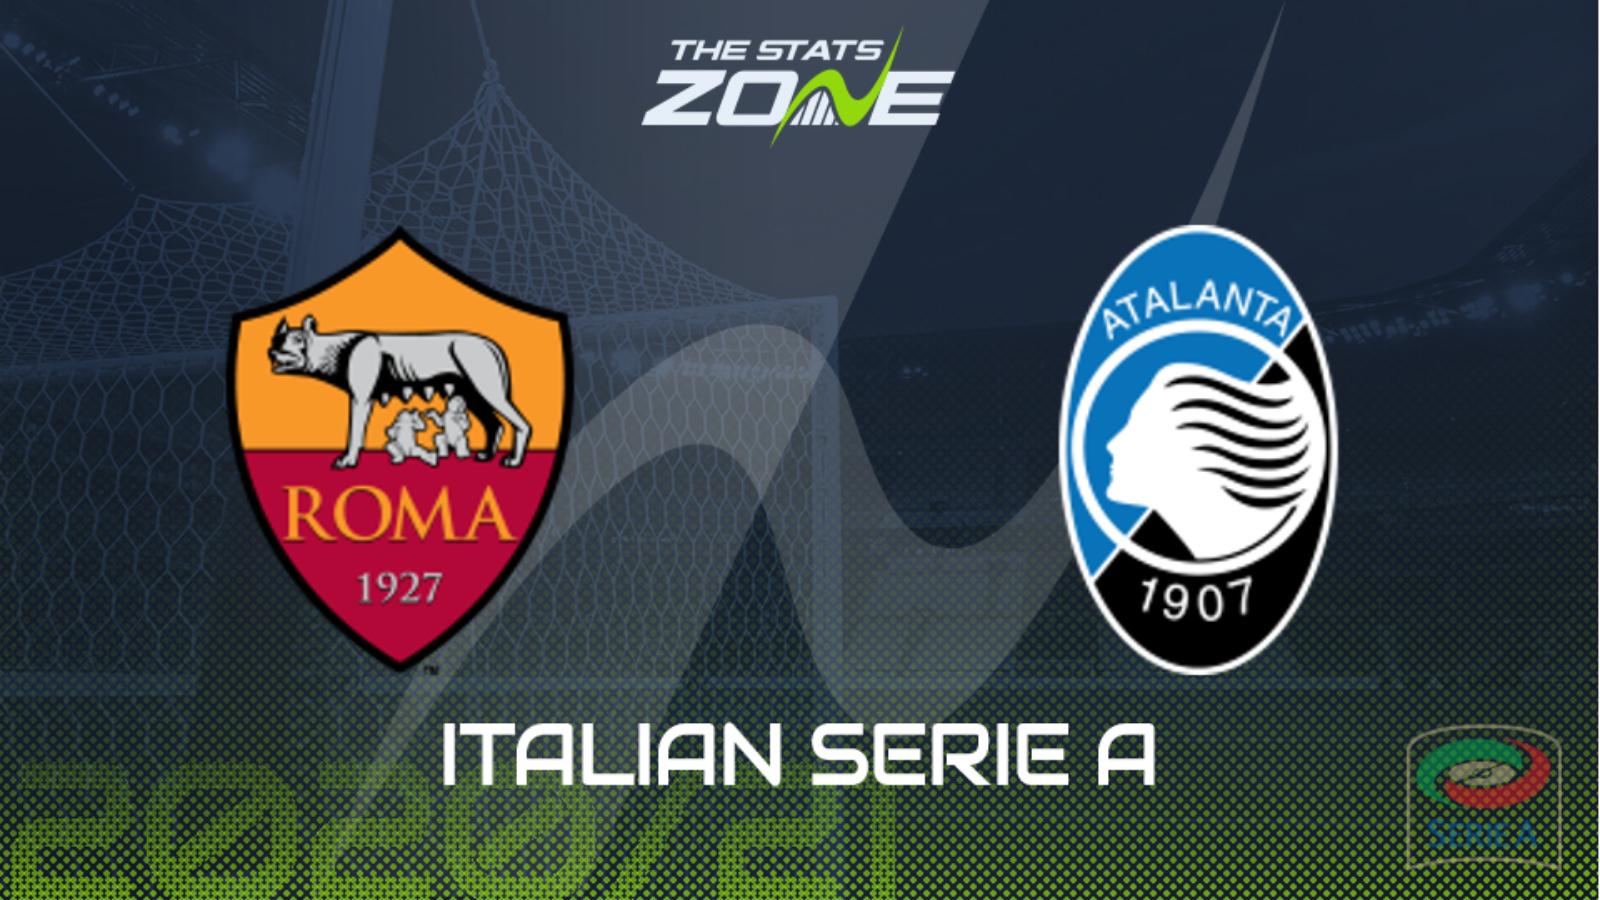 AS Roma vs Atalanta Full Match – Serie A 2020/21